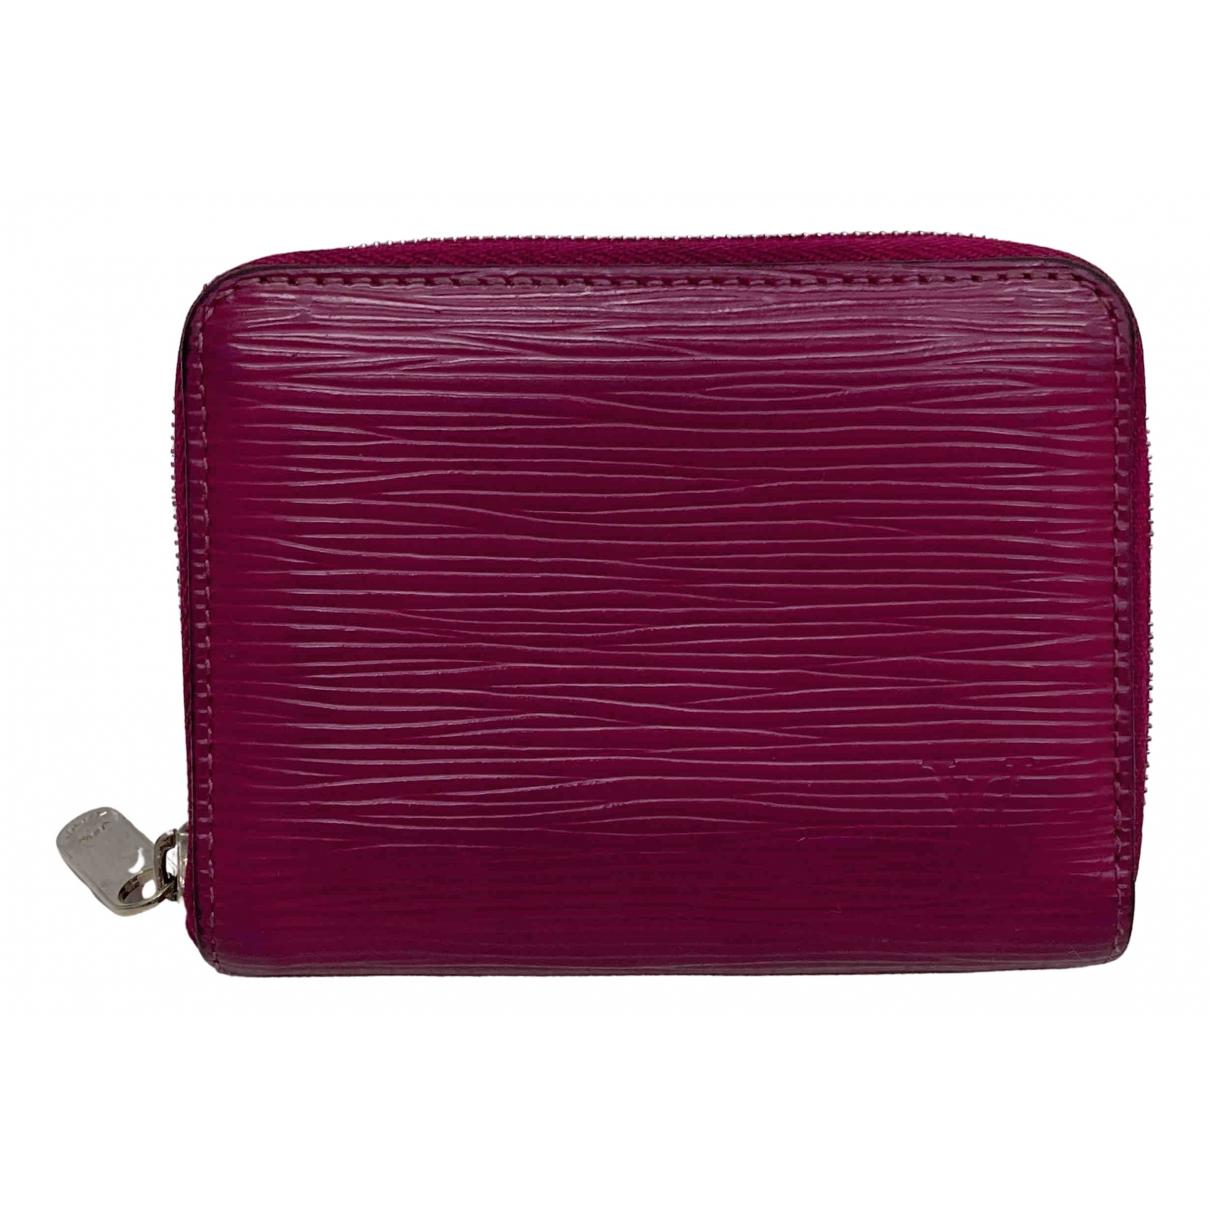 Louis Vuitton N Purple Leather Purses, wallet & cases for Women N